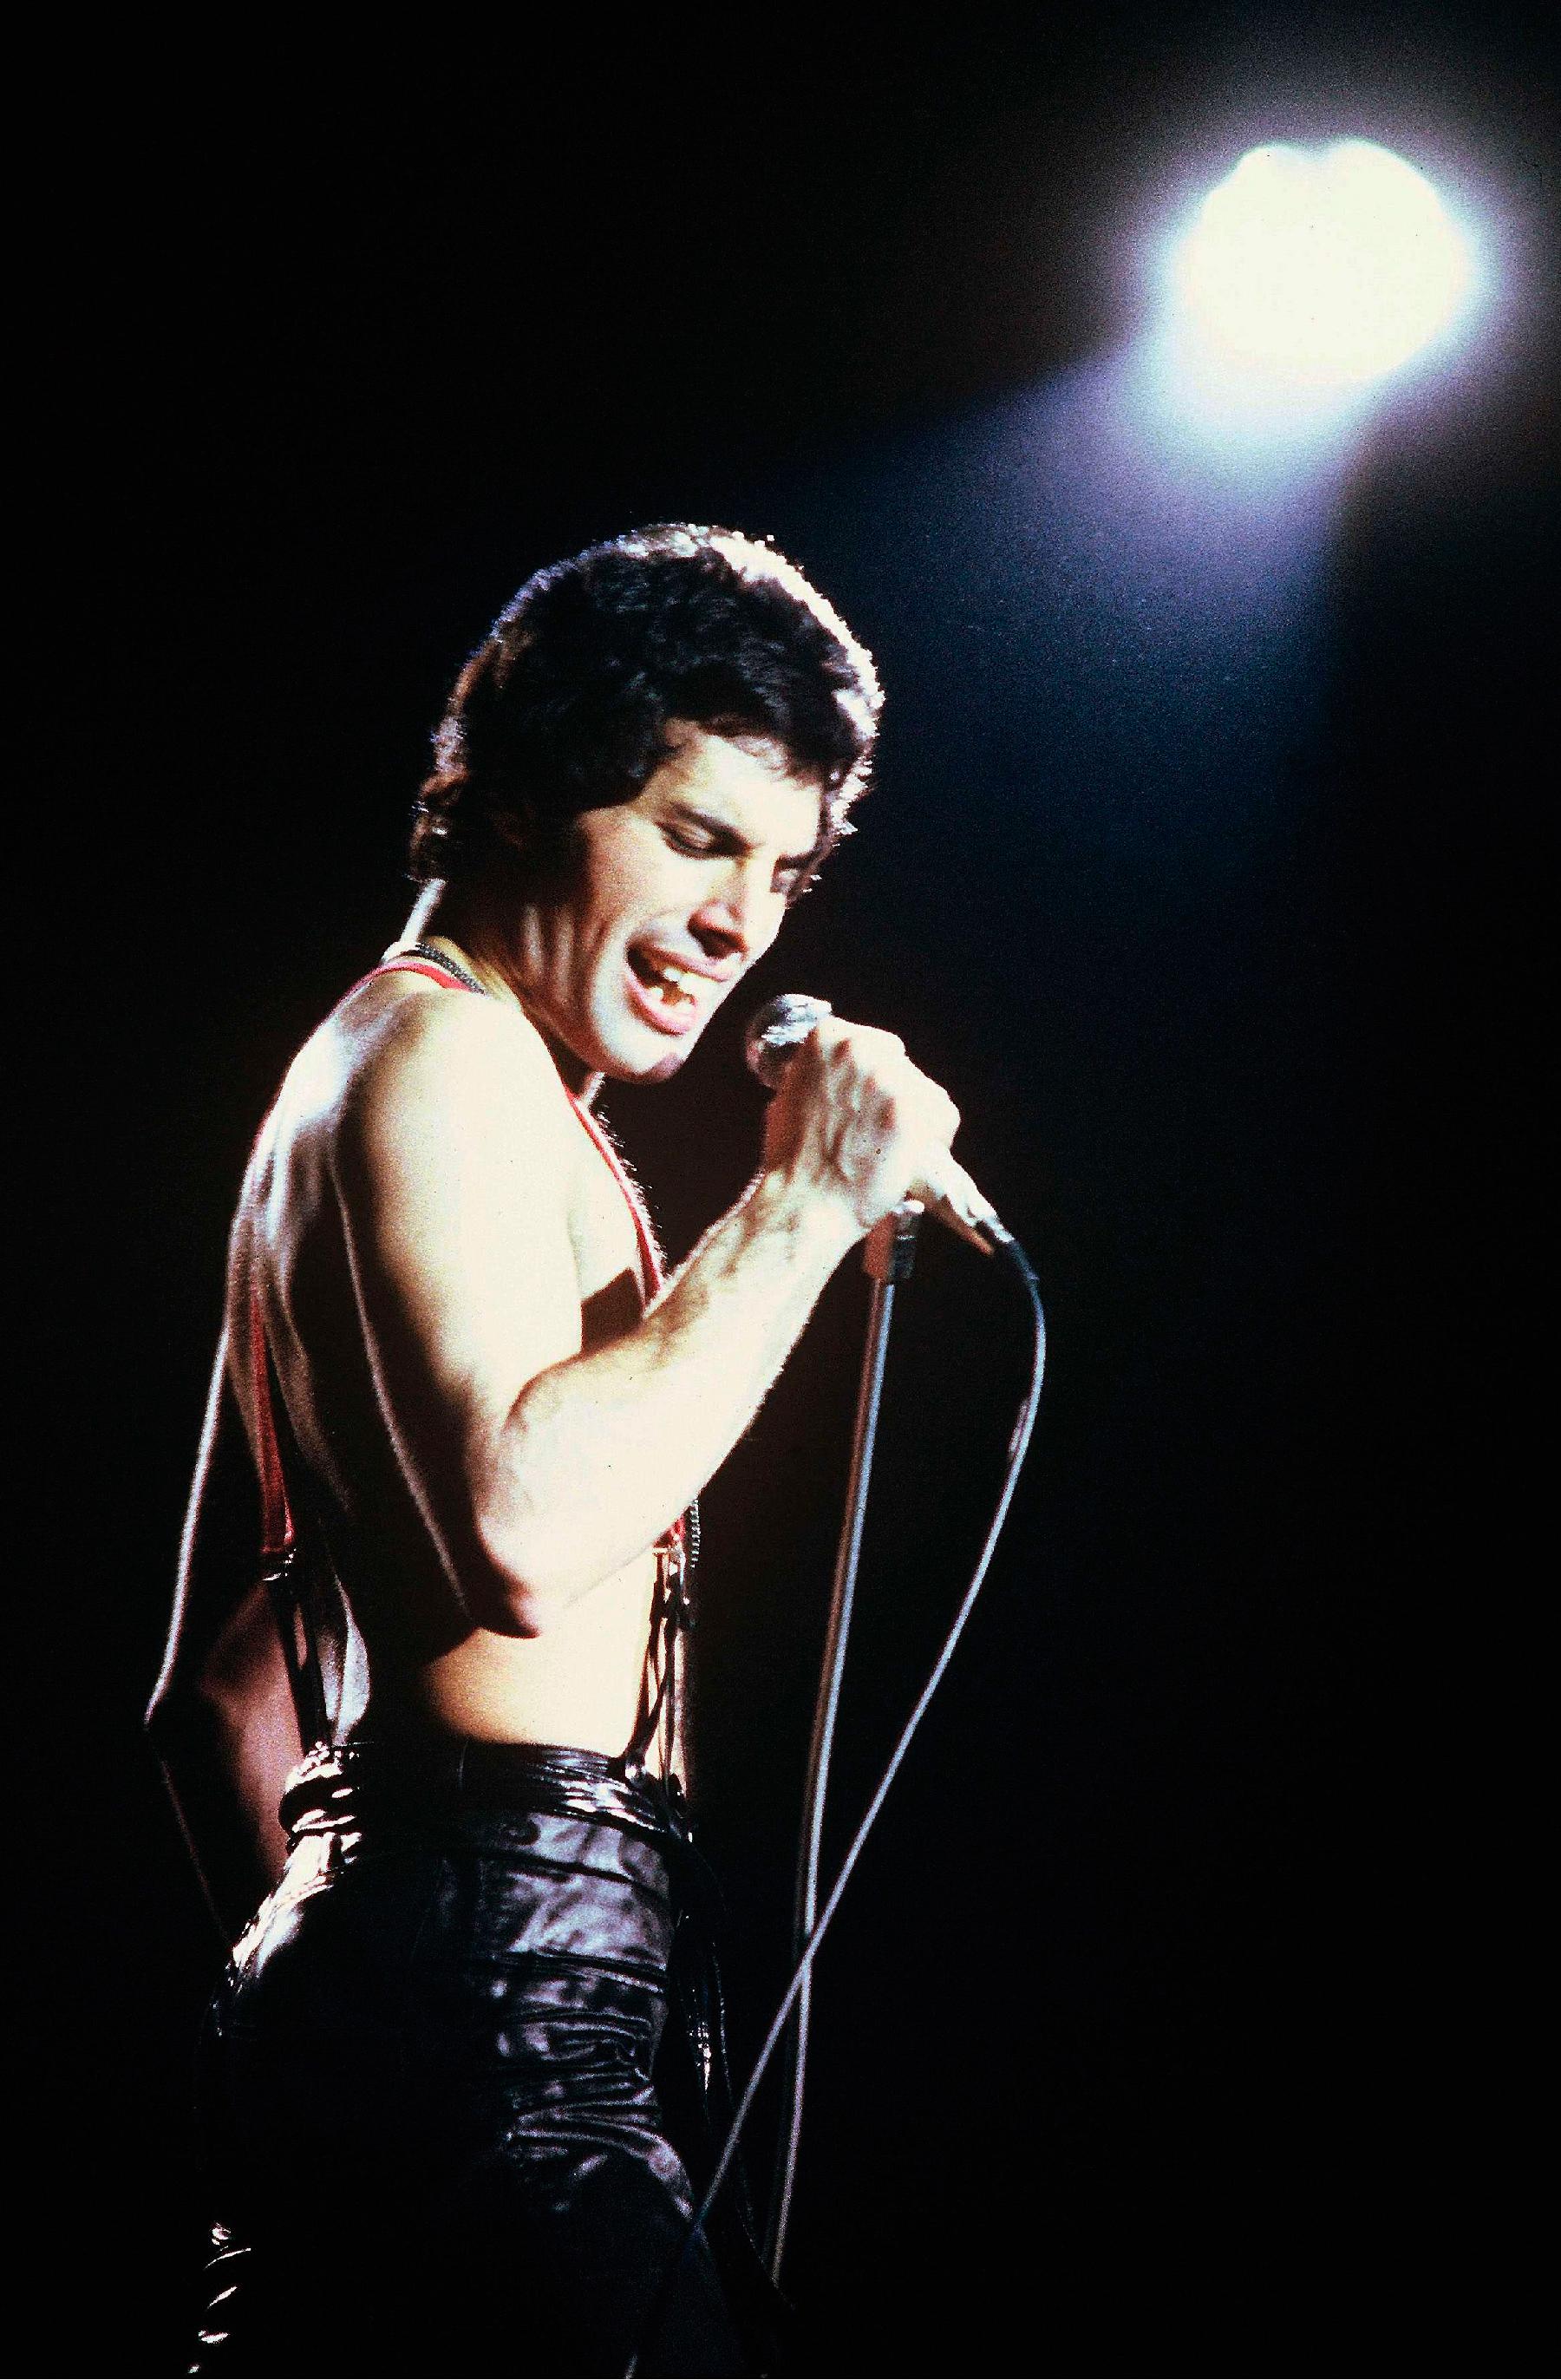 d19fd9dd330c2 Queen to Release New Album With Unreleased Freddie Mercury Songs ...